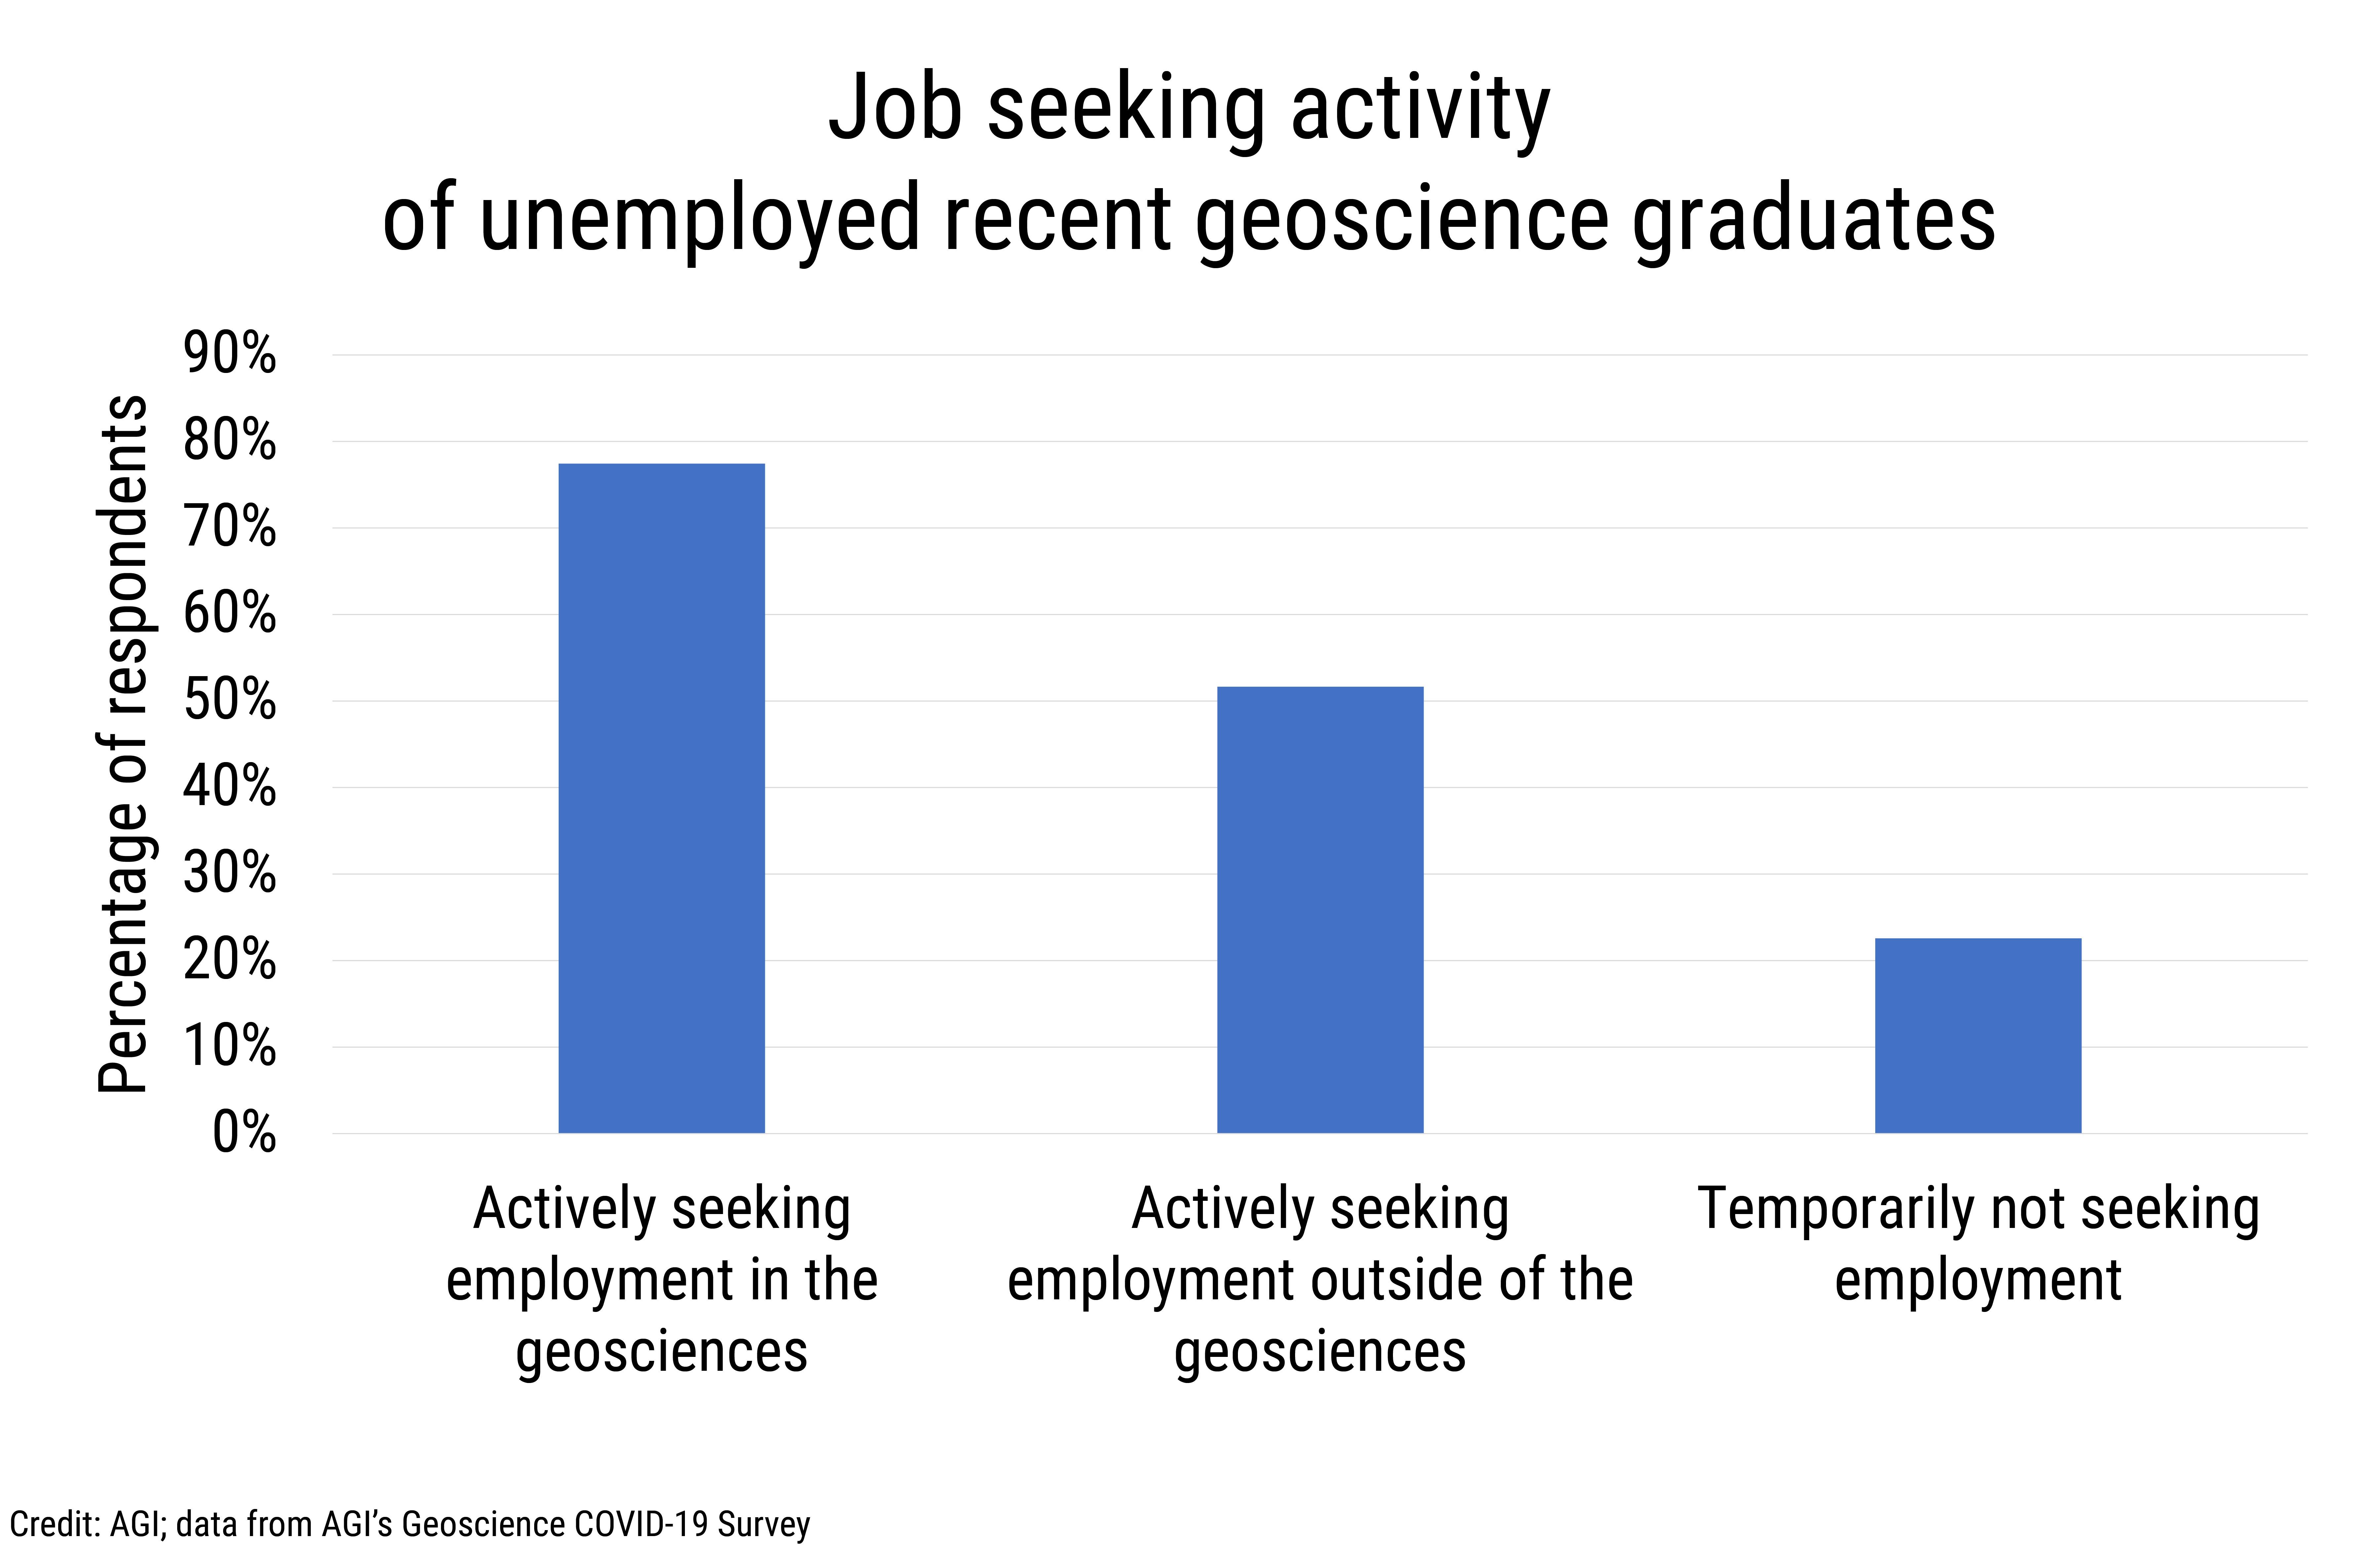 Data Brief 2020-010 chart 04: Job seeking activity of unemployed recent geoscience graduates (credit: AGI; data from AGI's Geoscience COVID-19 Survey)